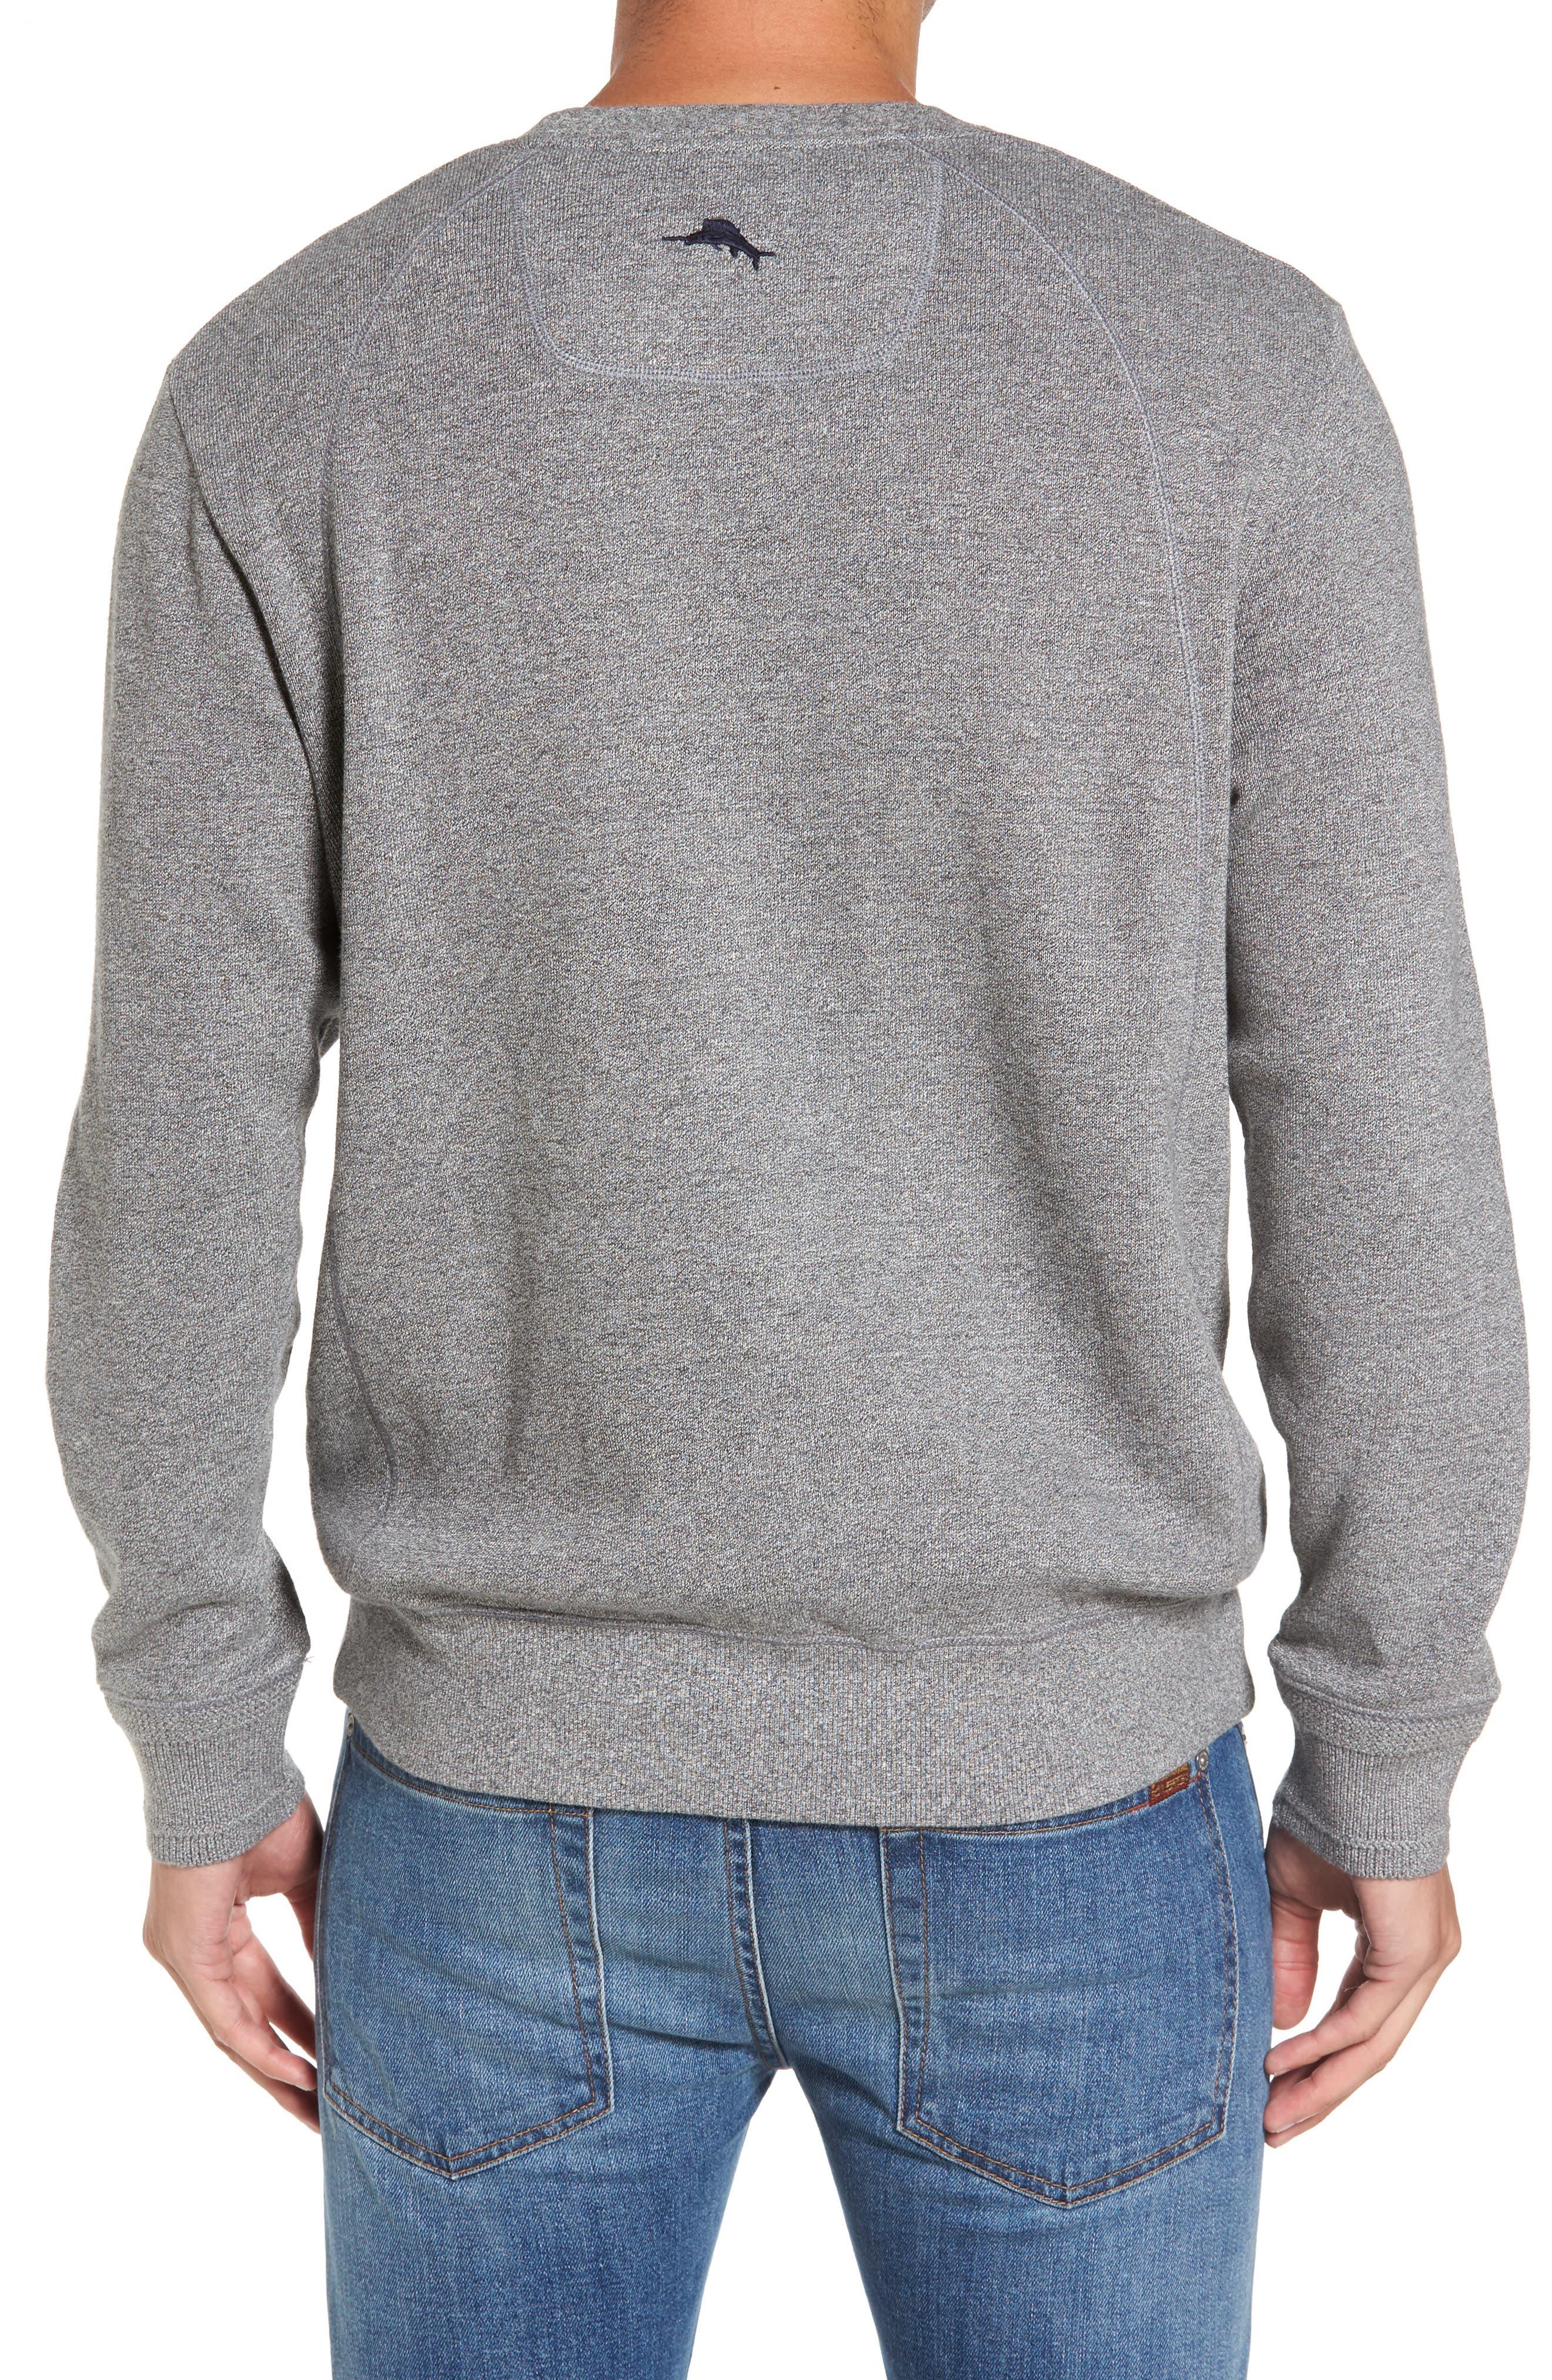 NFL Stitch of Liberty Embroidered Crewneck Sweatshirt,                             Alternate thumbnail 54, color,